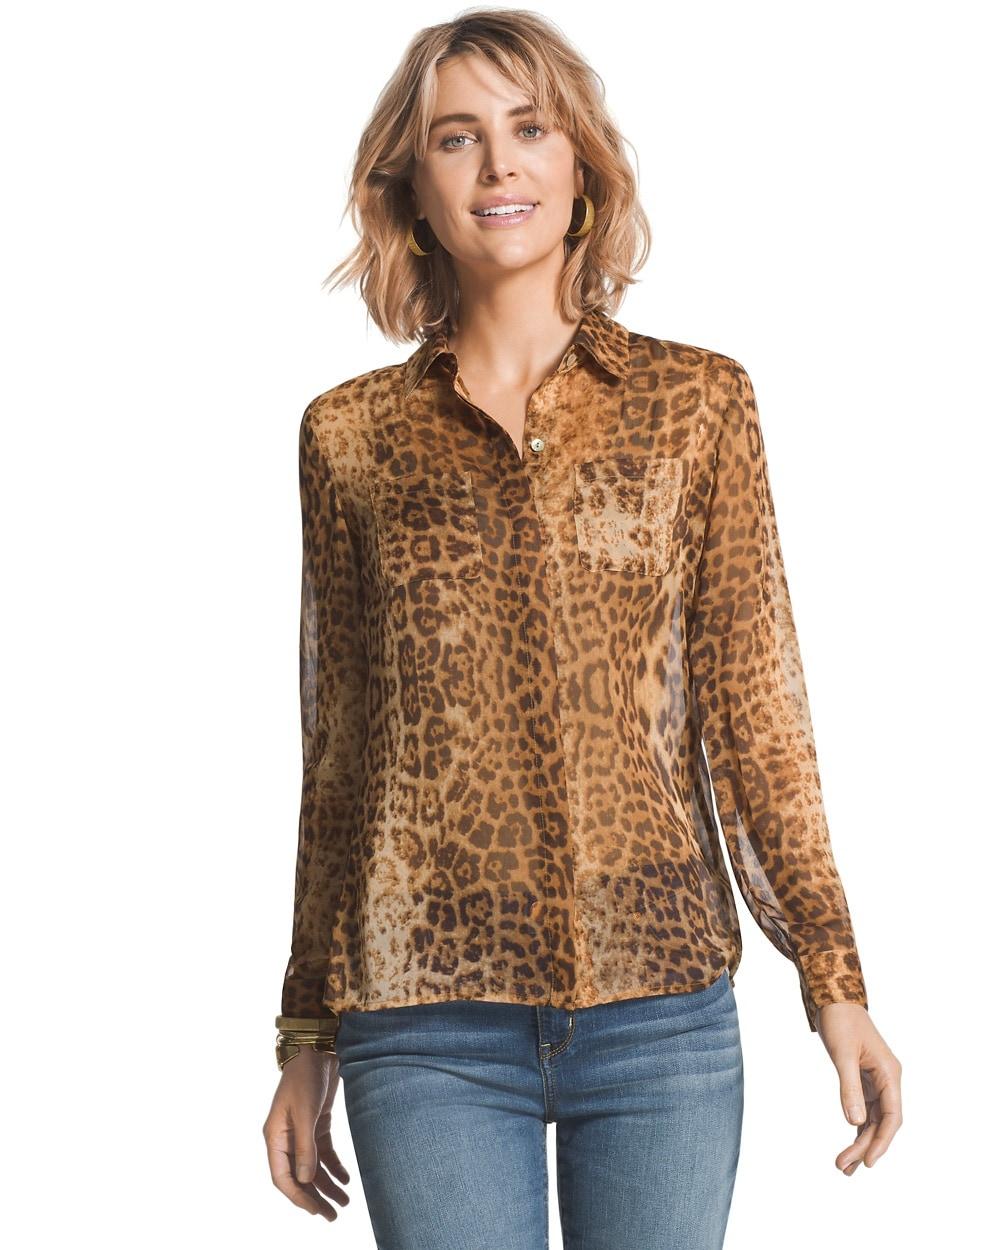 60ed8e1927edc Return to thumbnail image selection Leopard Dreams Liana Shirt video  preview image